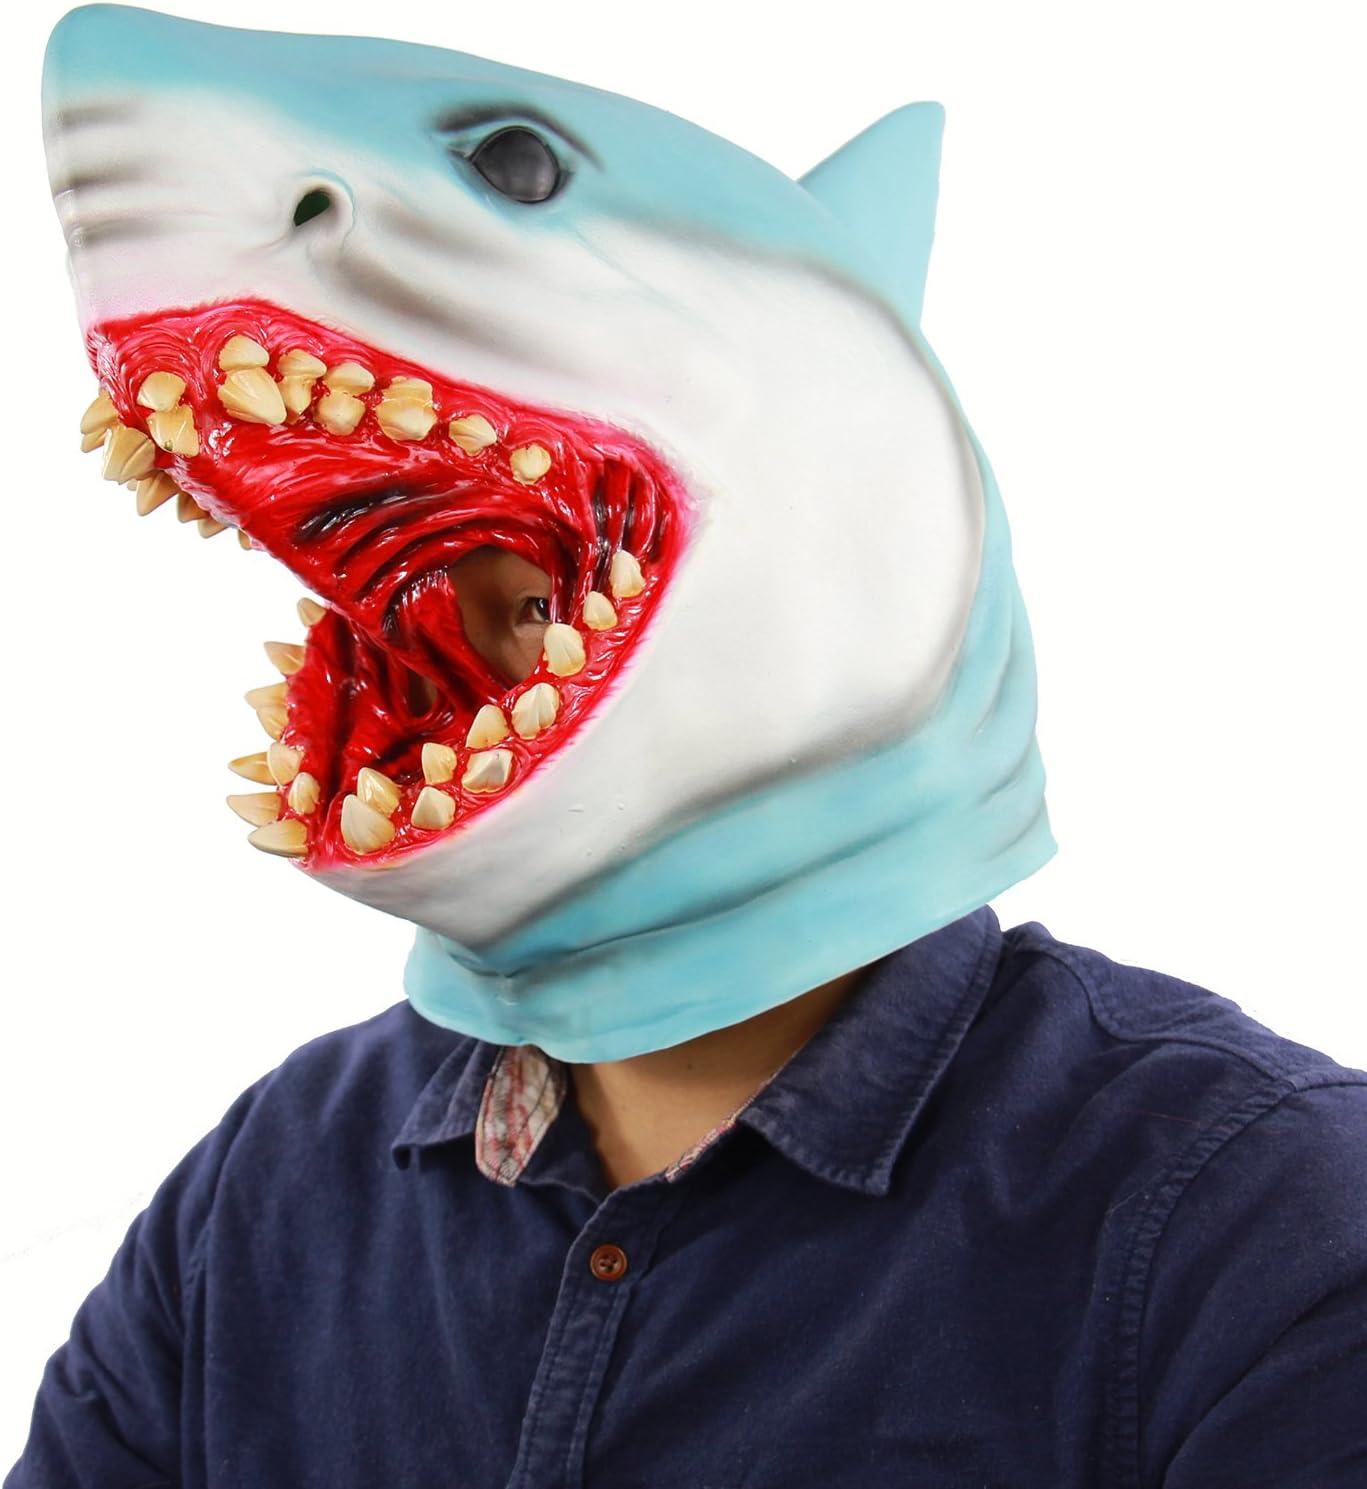 Latex Animal Mask Costume Accessory Novelty Halloween Party Head Mask Shark MaskScary Fancy Dress Party Ocean Fish Cosplay